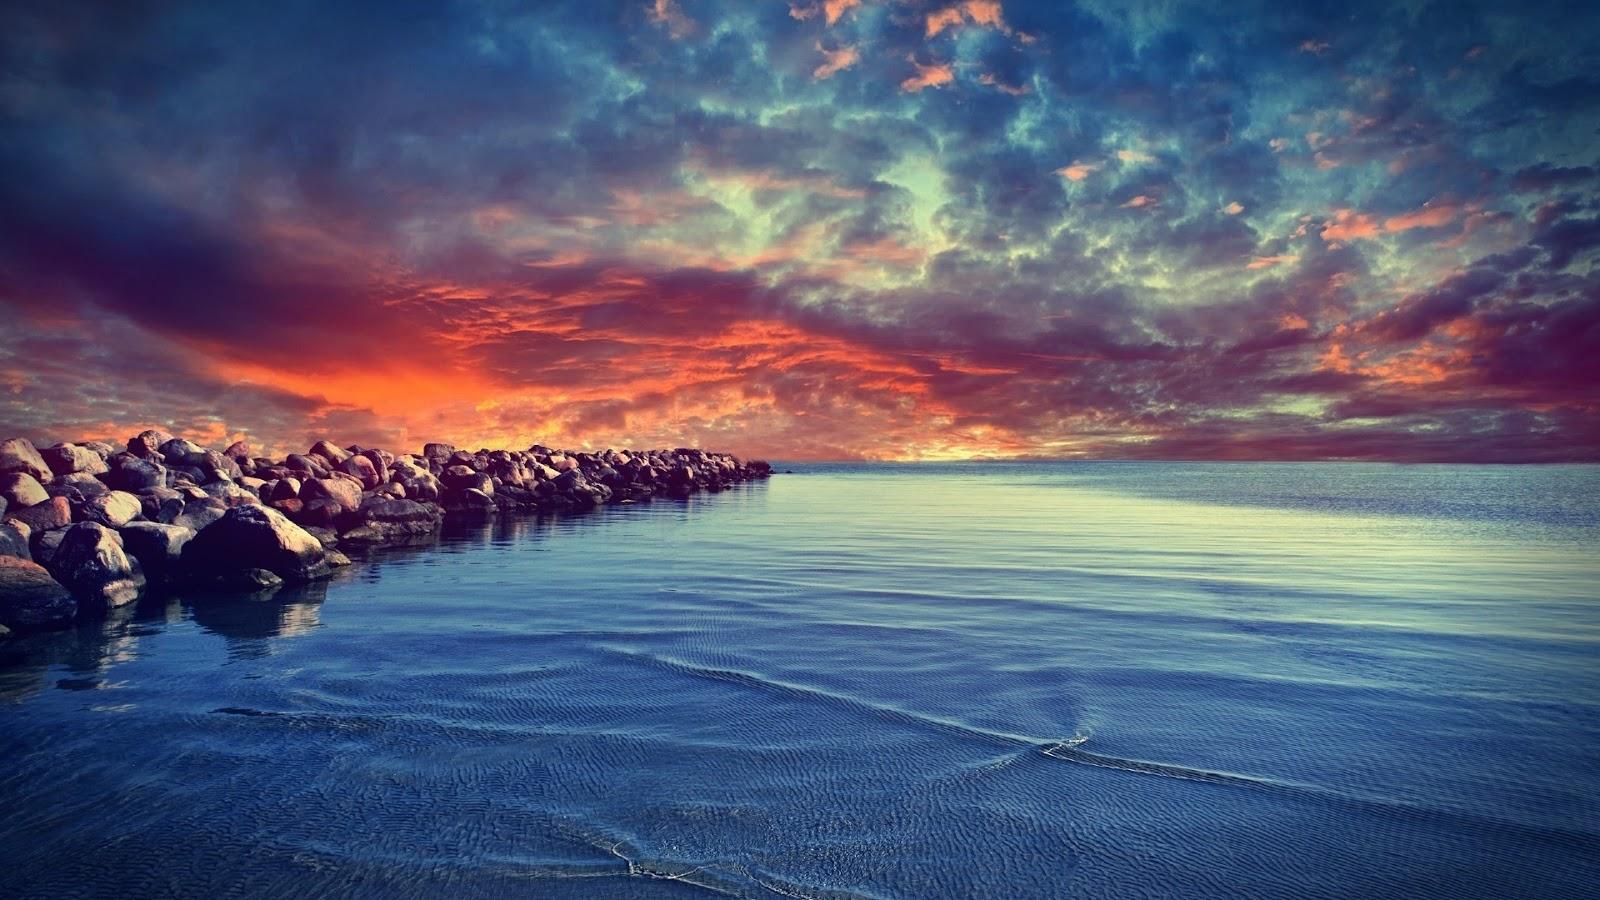 Nice Sunset in the coast